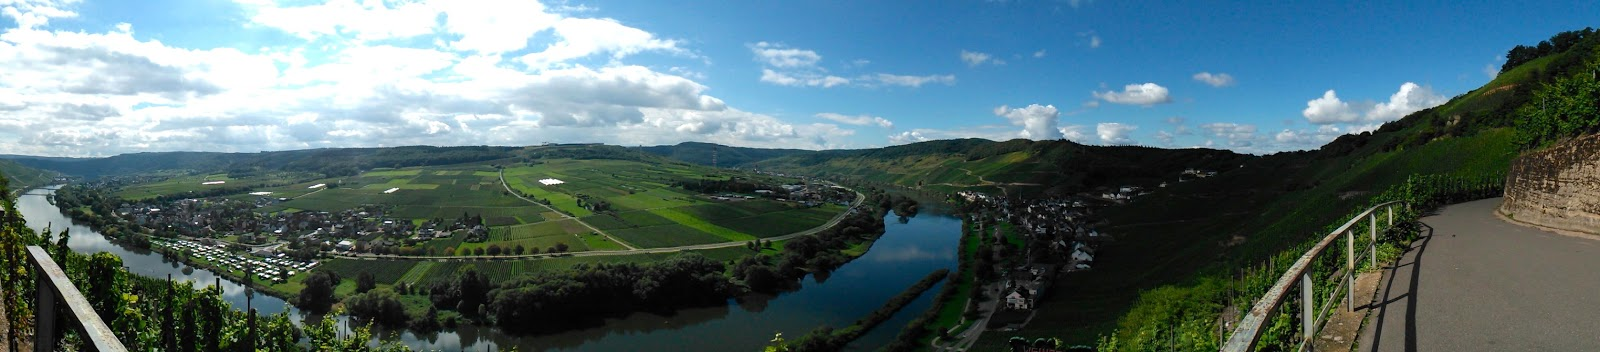 Ürziger panorama, Rhineland-Palatinate, Germany